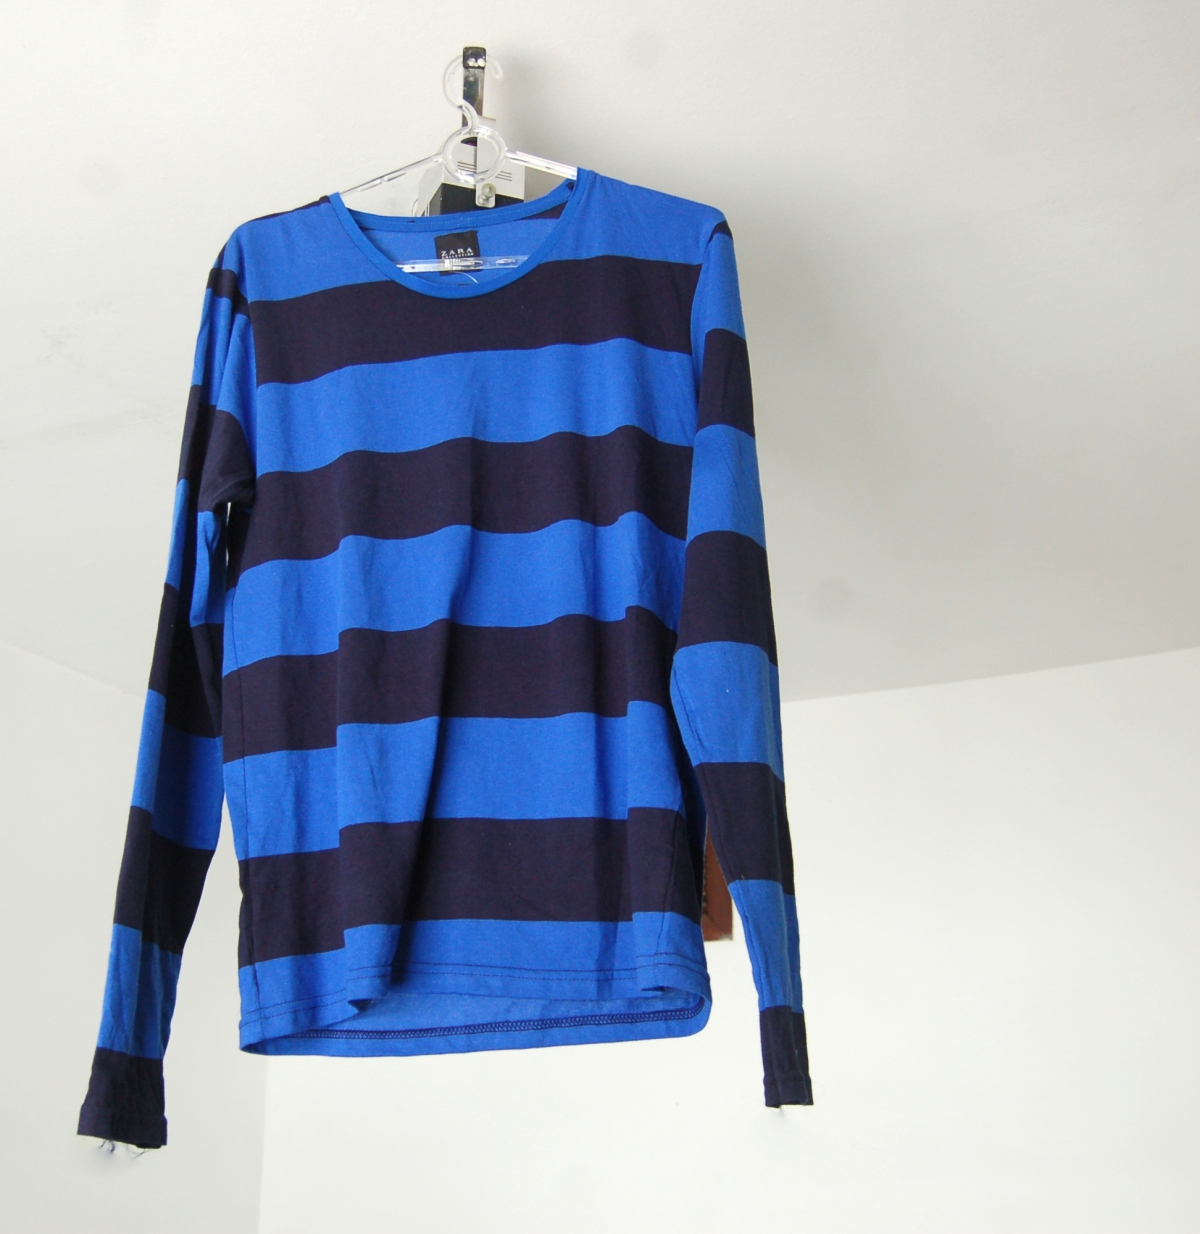 Blusa (Shirt), Zara Man